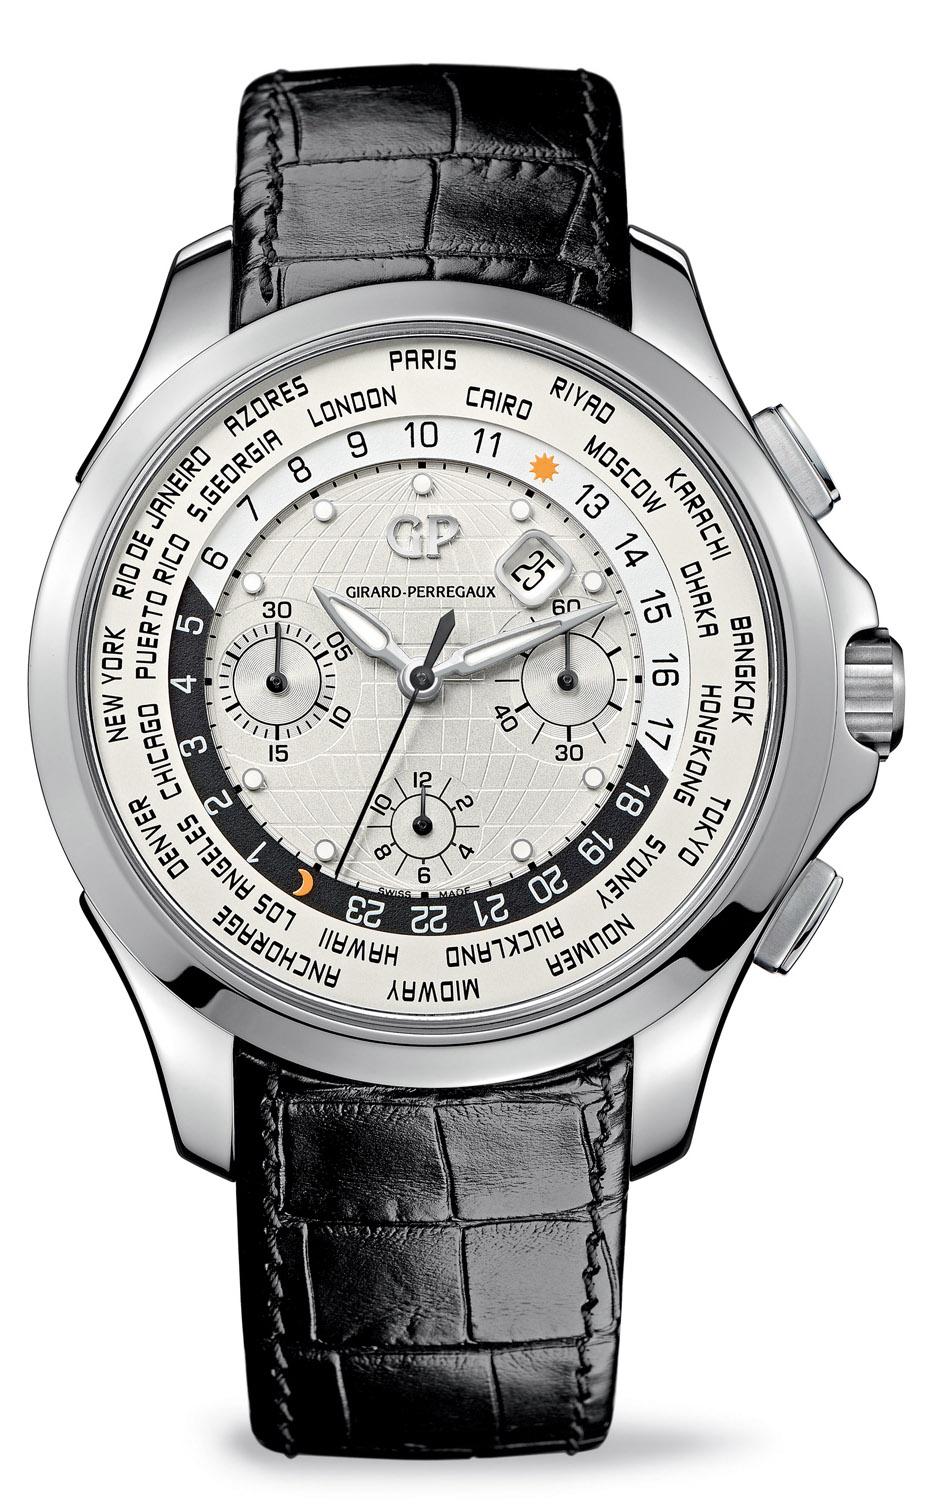 Girard-Perregaux Traveller WW.TC Chronograph